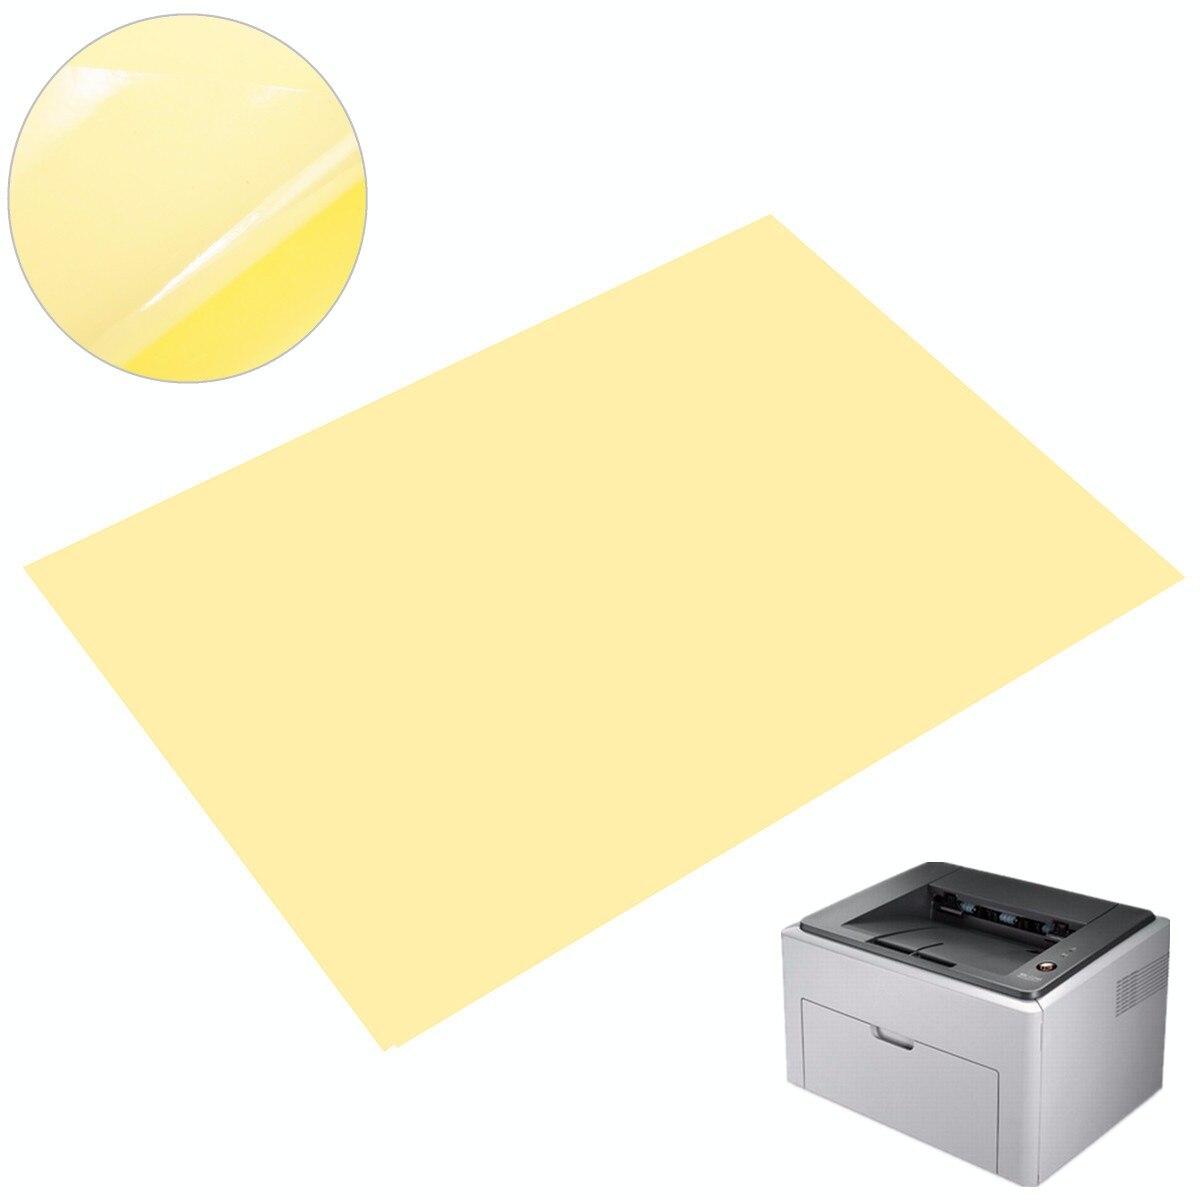 50pcs A4 PVC Sticker Vinyl Self Adhesive Sticker Paper Transparent Clear Sticker For Laser Printer Lamination Film Paper